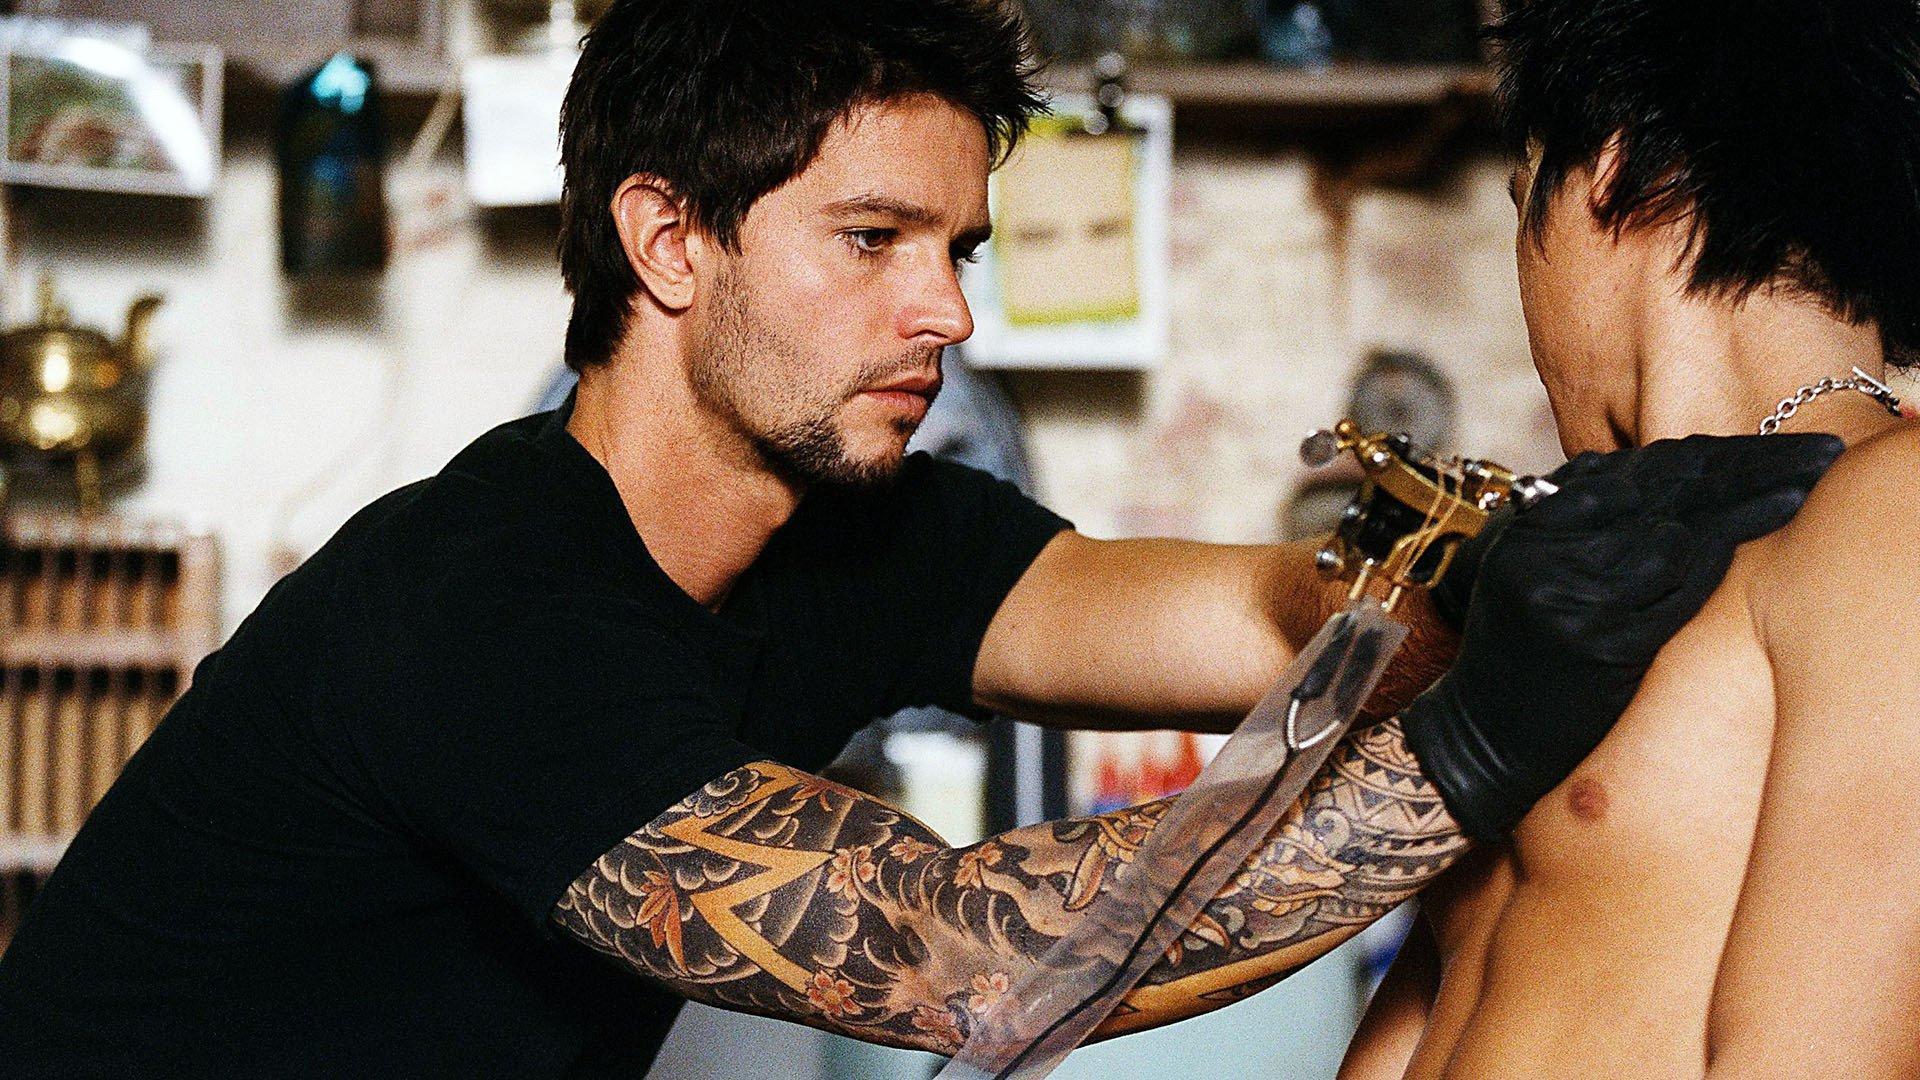 Татуировки нарушают терморегуляцию организма